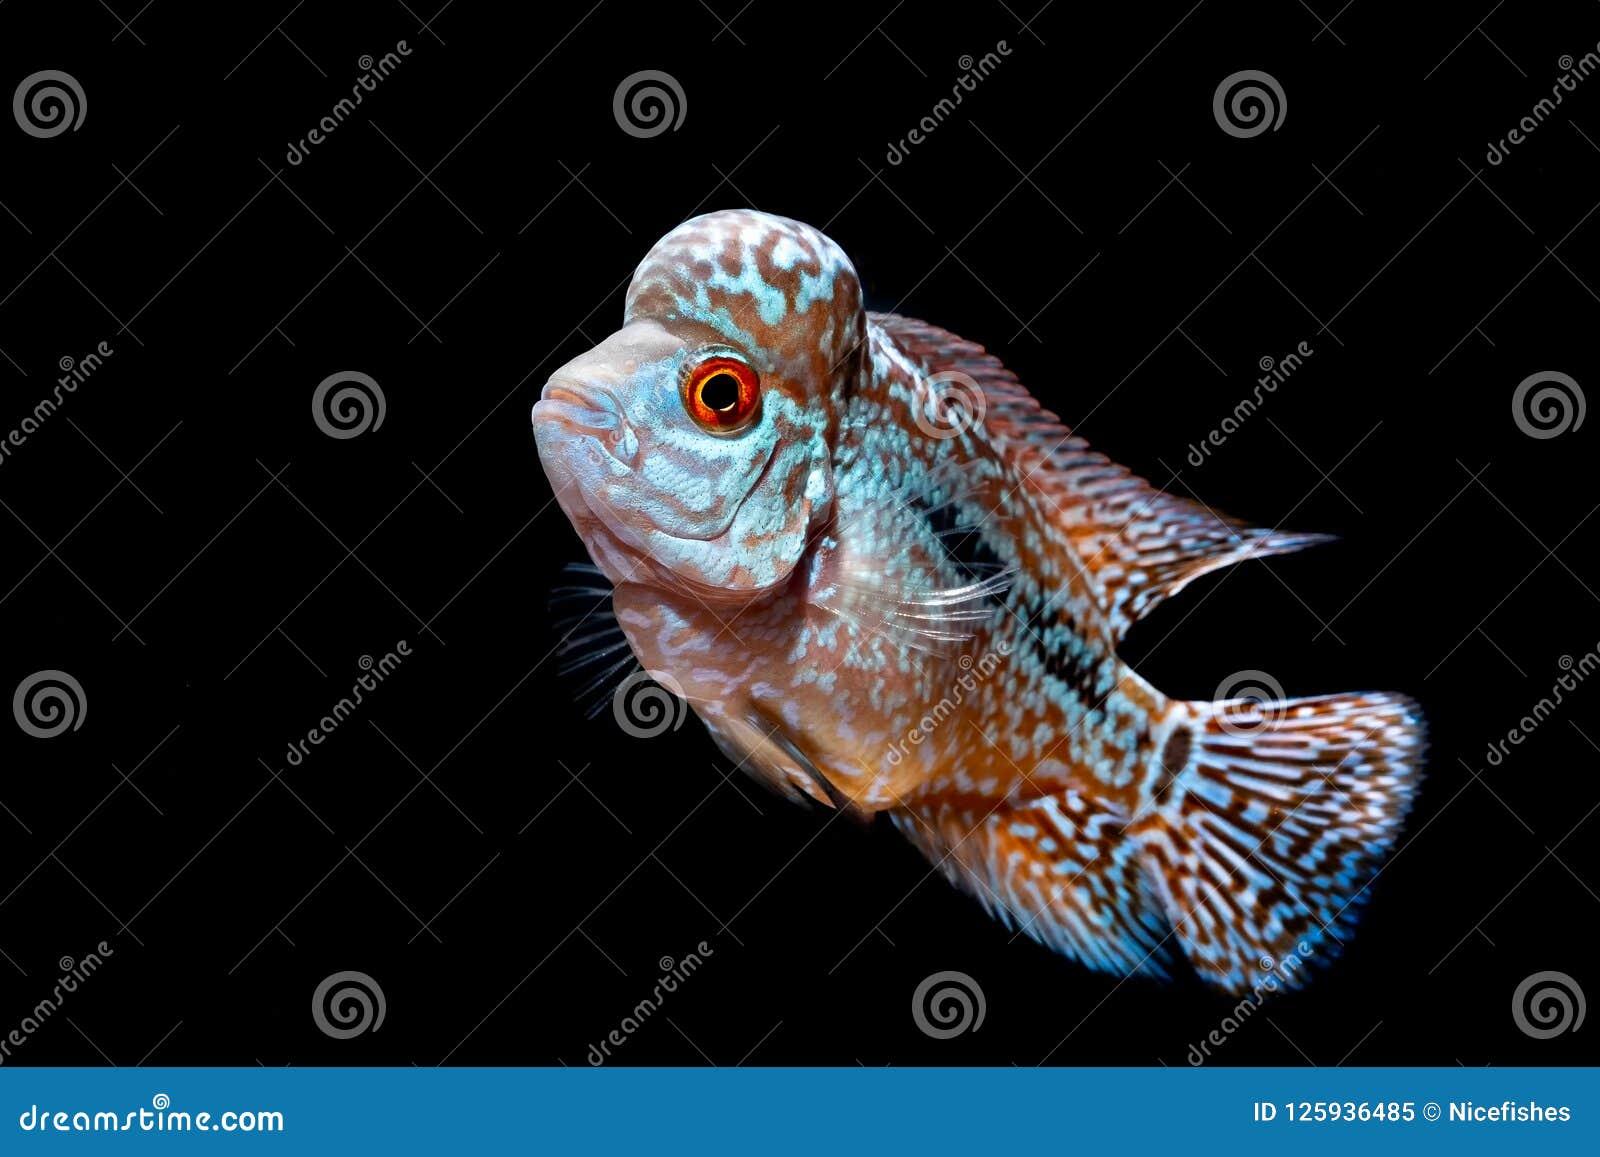 Cichlids Kingkamfa In The Aquarium Stock Image Image Of Fish